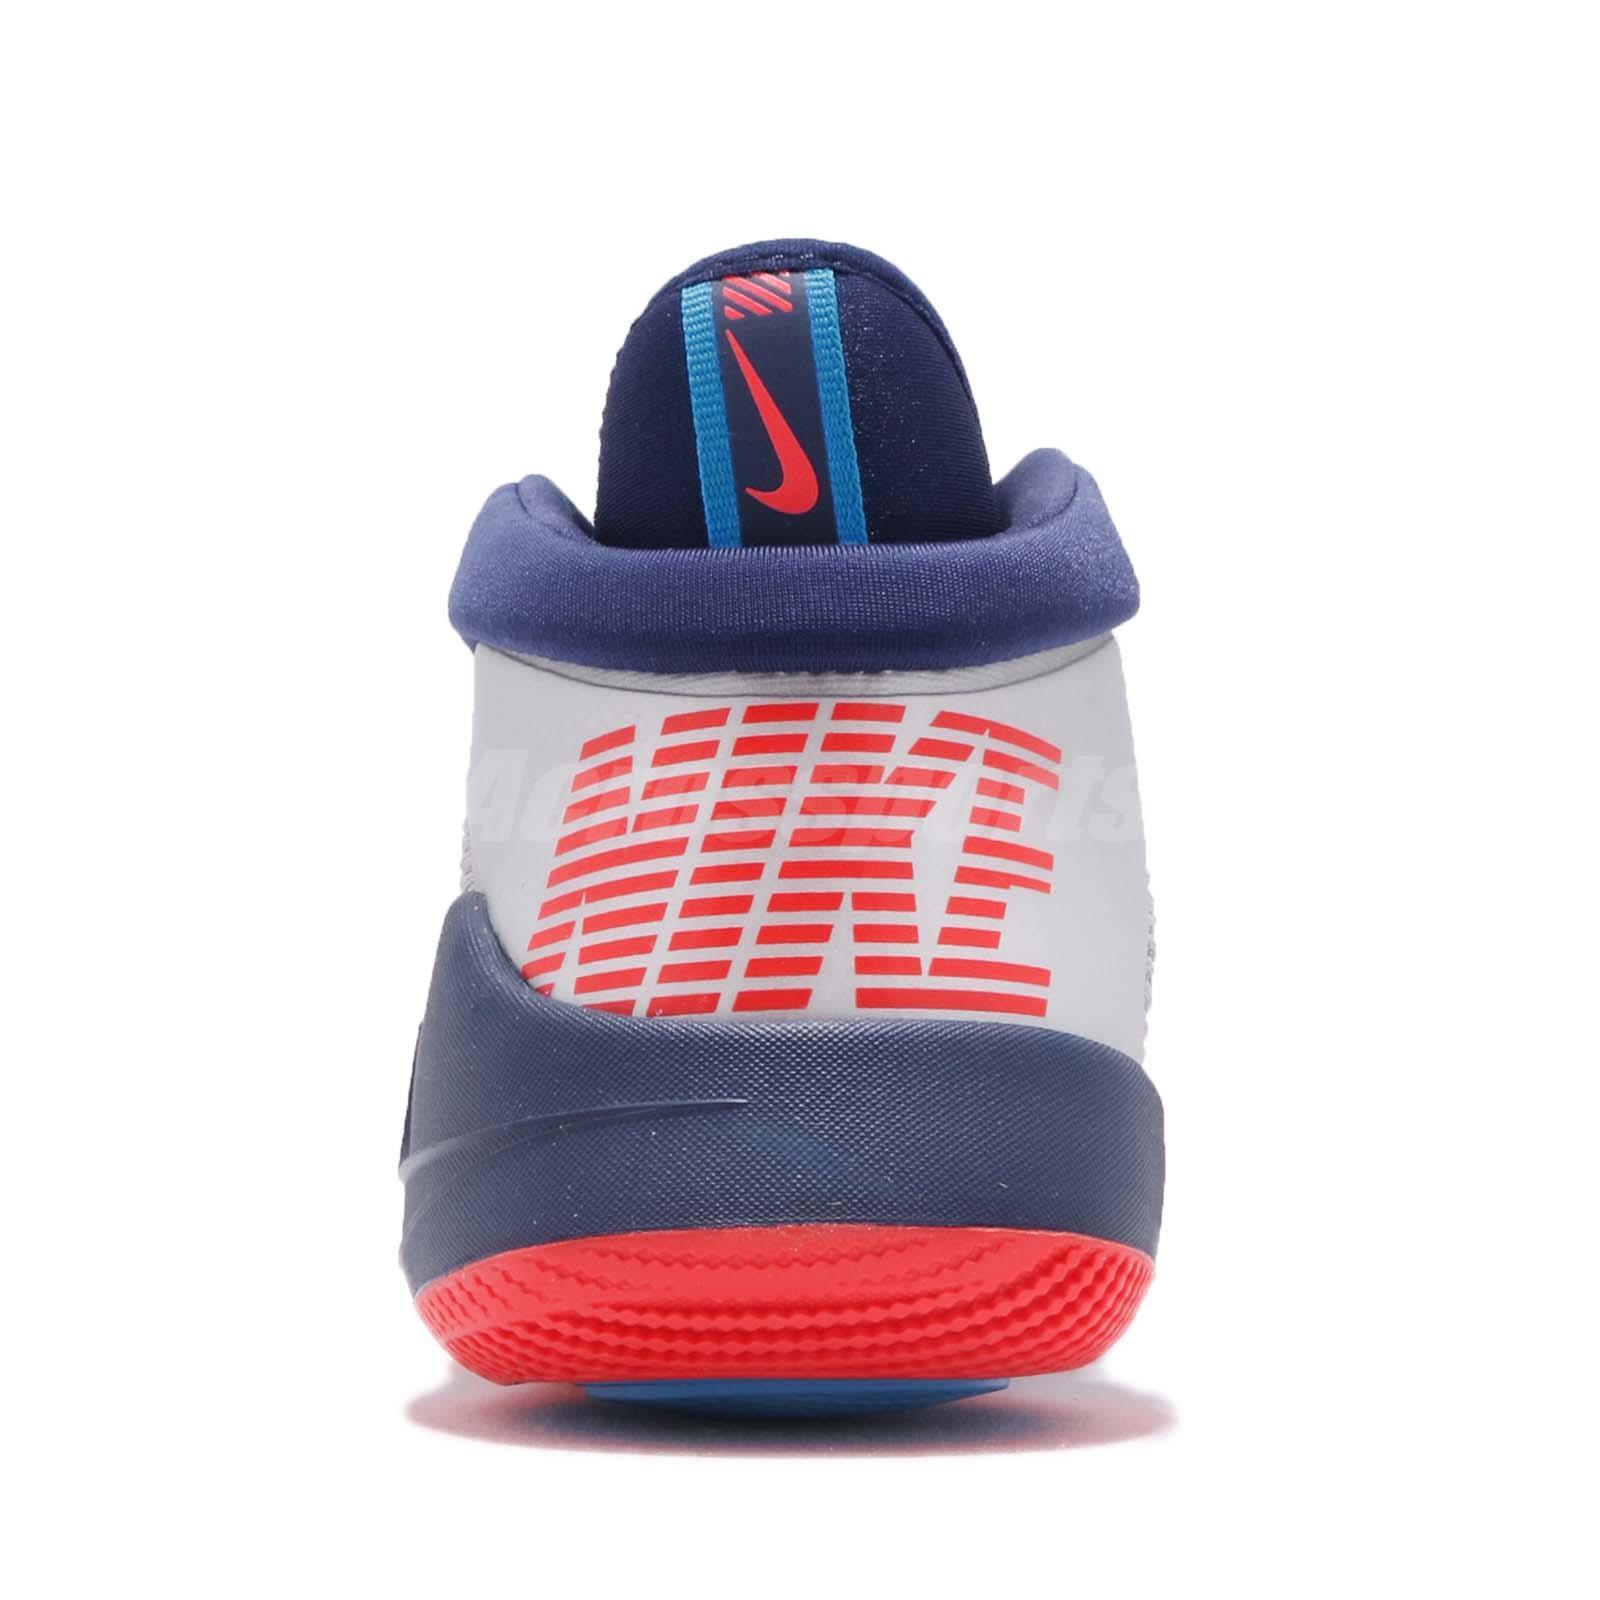 2ca4e73f7c450f Nike Future Flight GS Blue Navy Grey Kid Youth Women Basketball ...